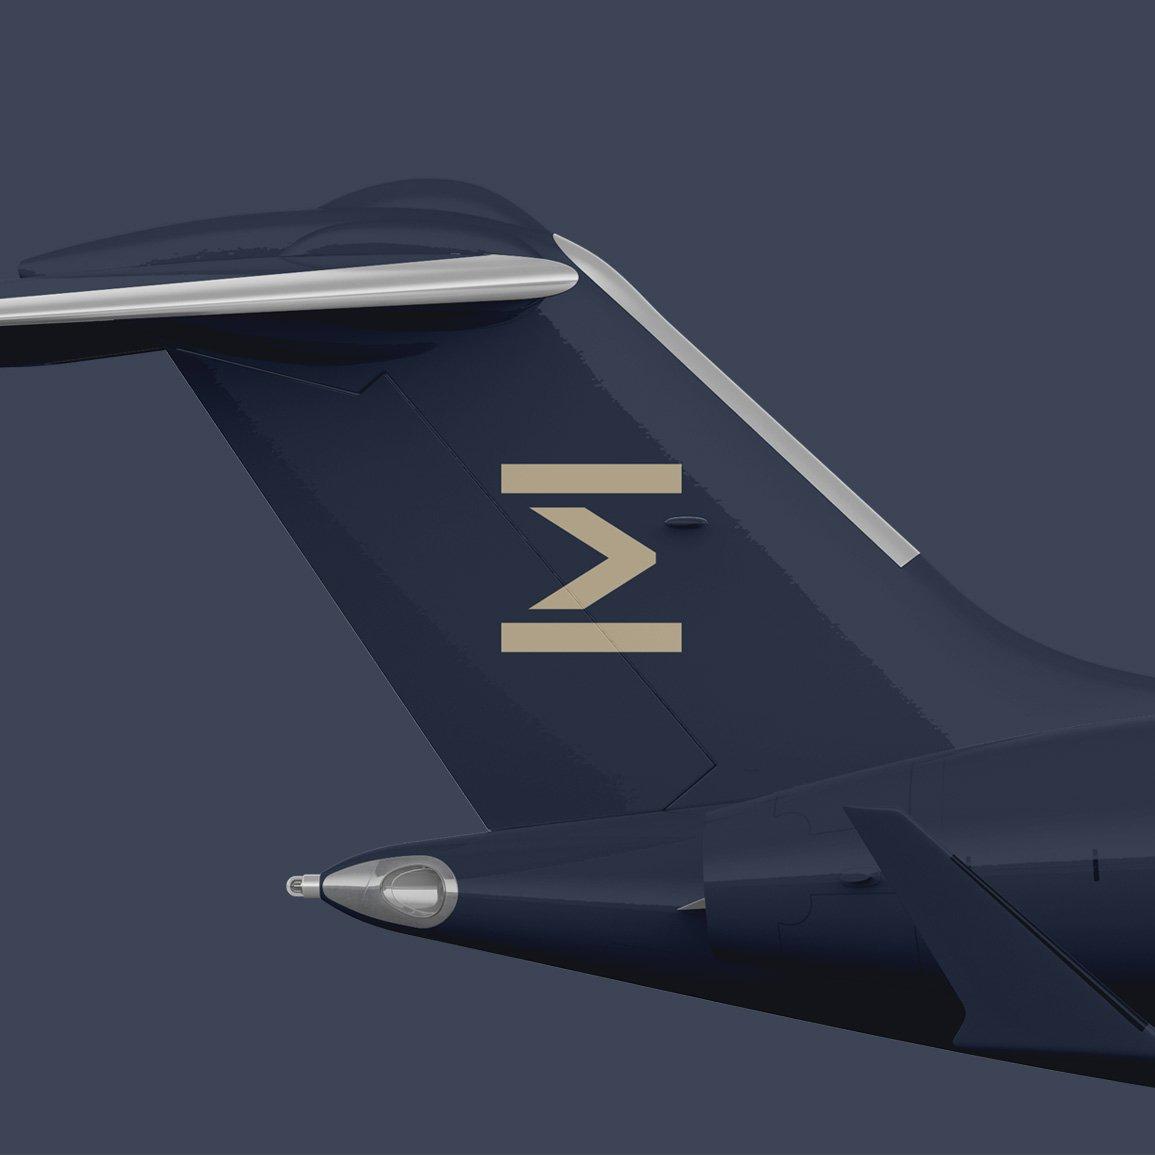 Private jet company brand aircraft design